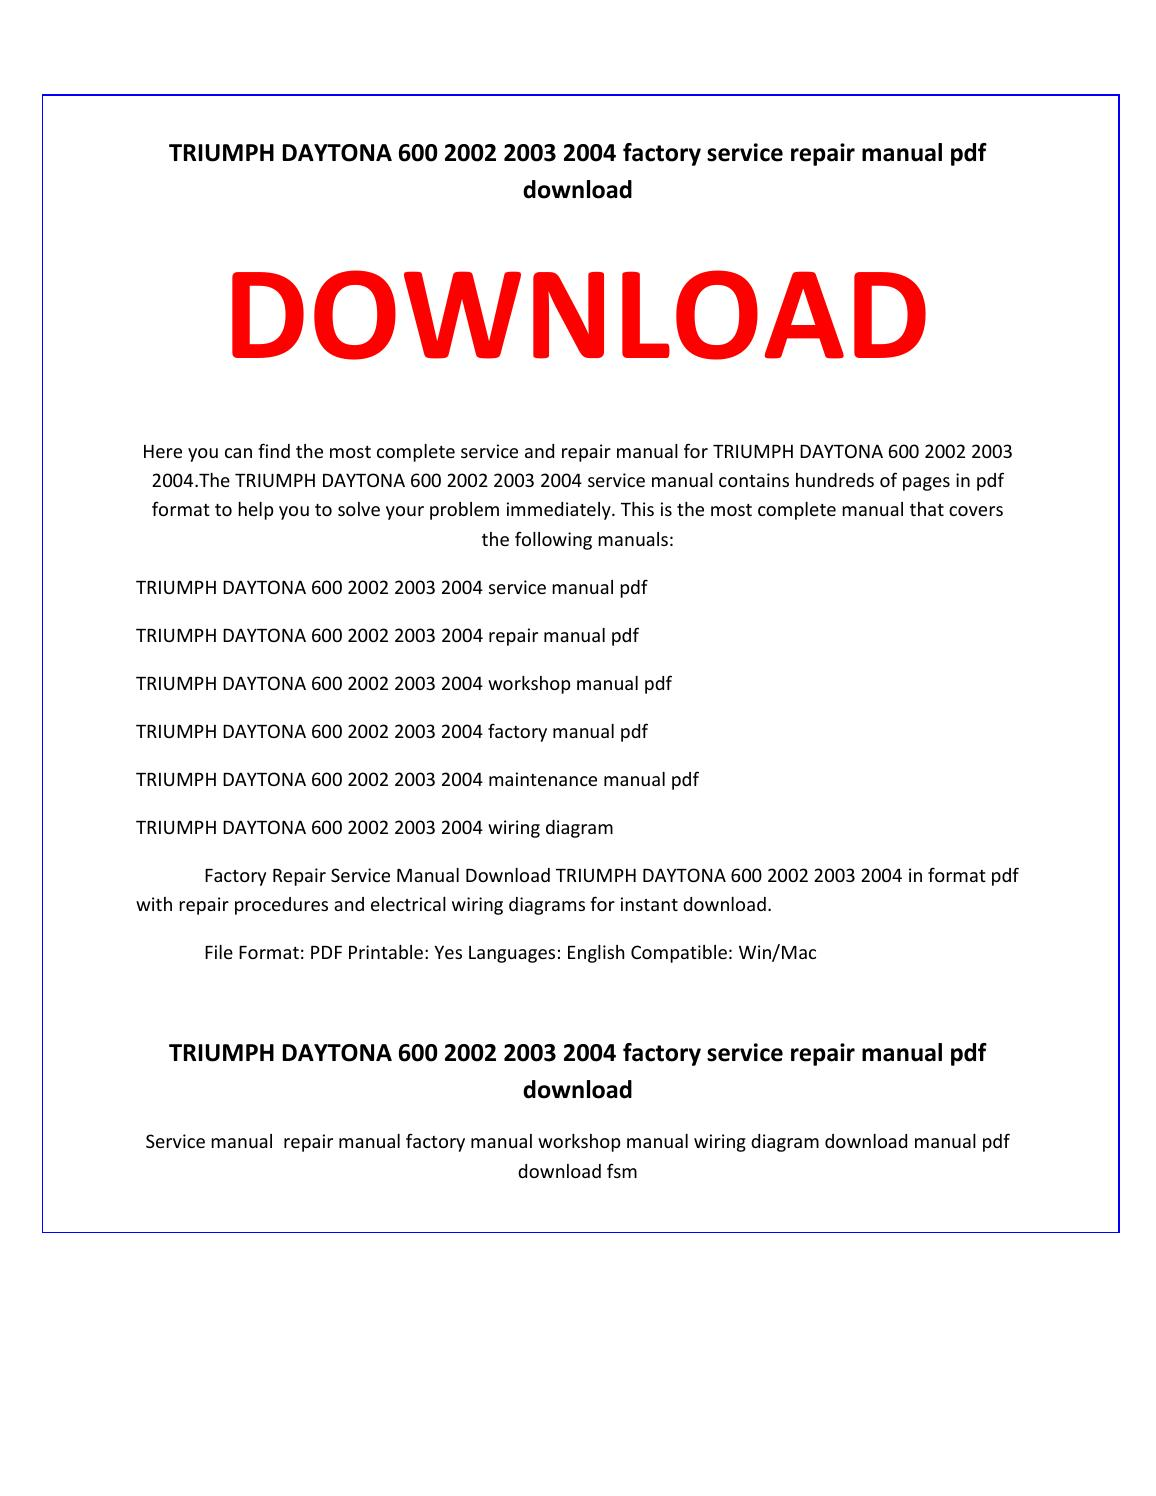 hight resolution of triumph daytona 600 2002 2003 2004 service repair manual by service manual issuu